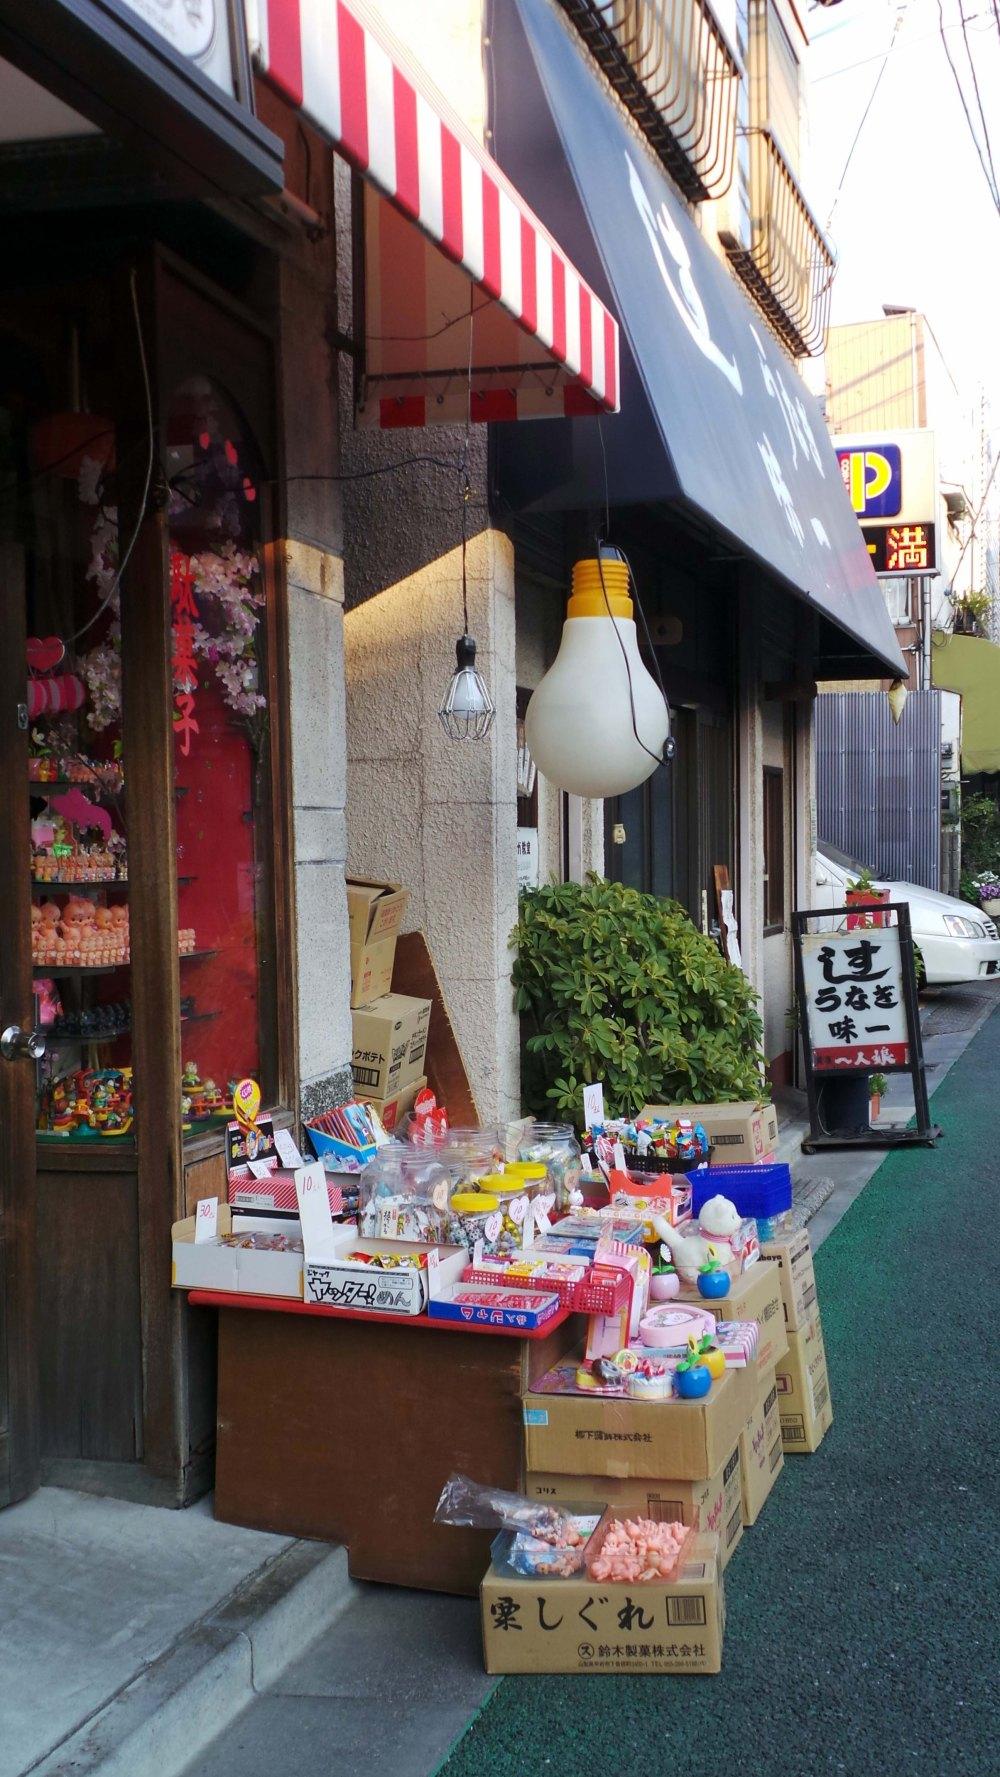 Visiter le quartier de Shimokitazawa à Tokyo